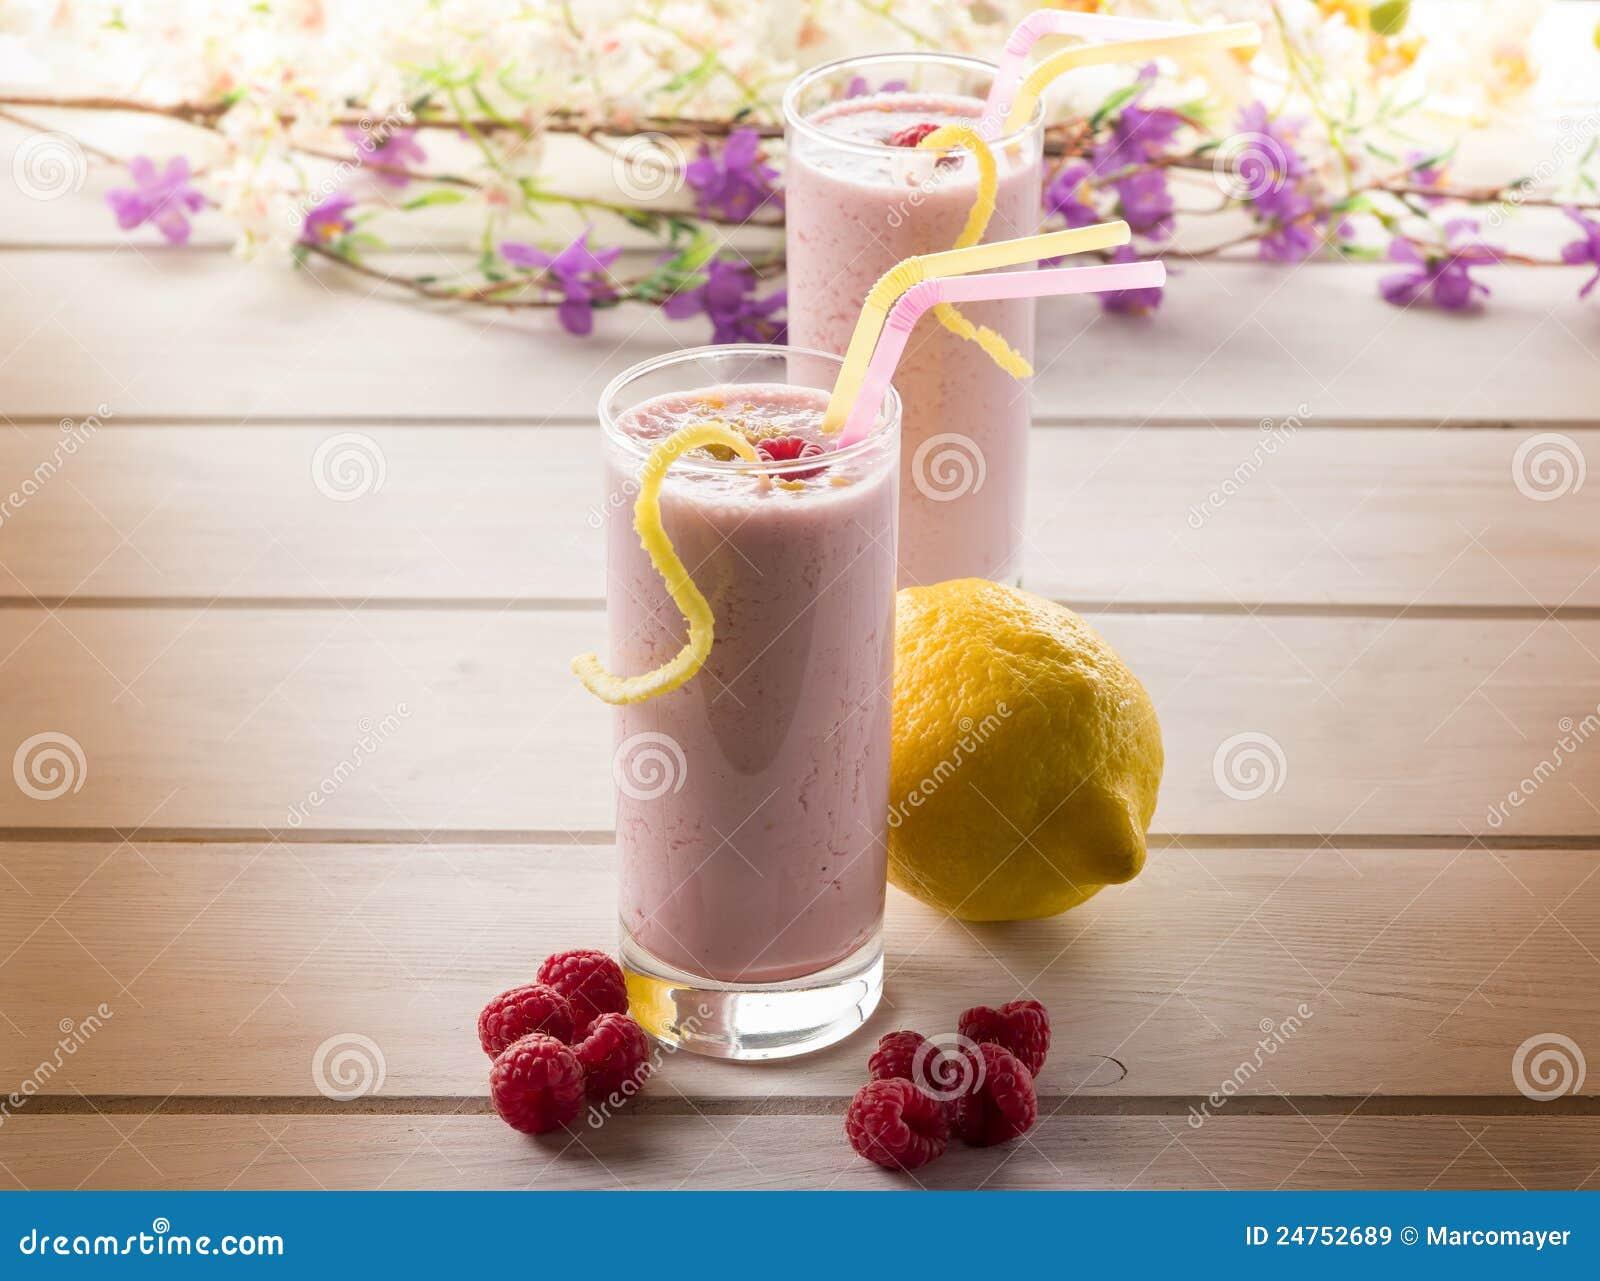 Raspberry milkshake on glass